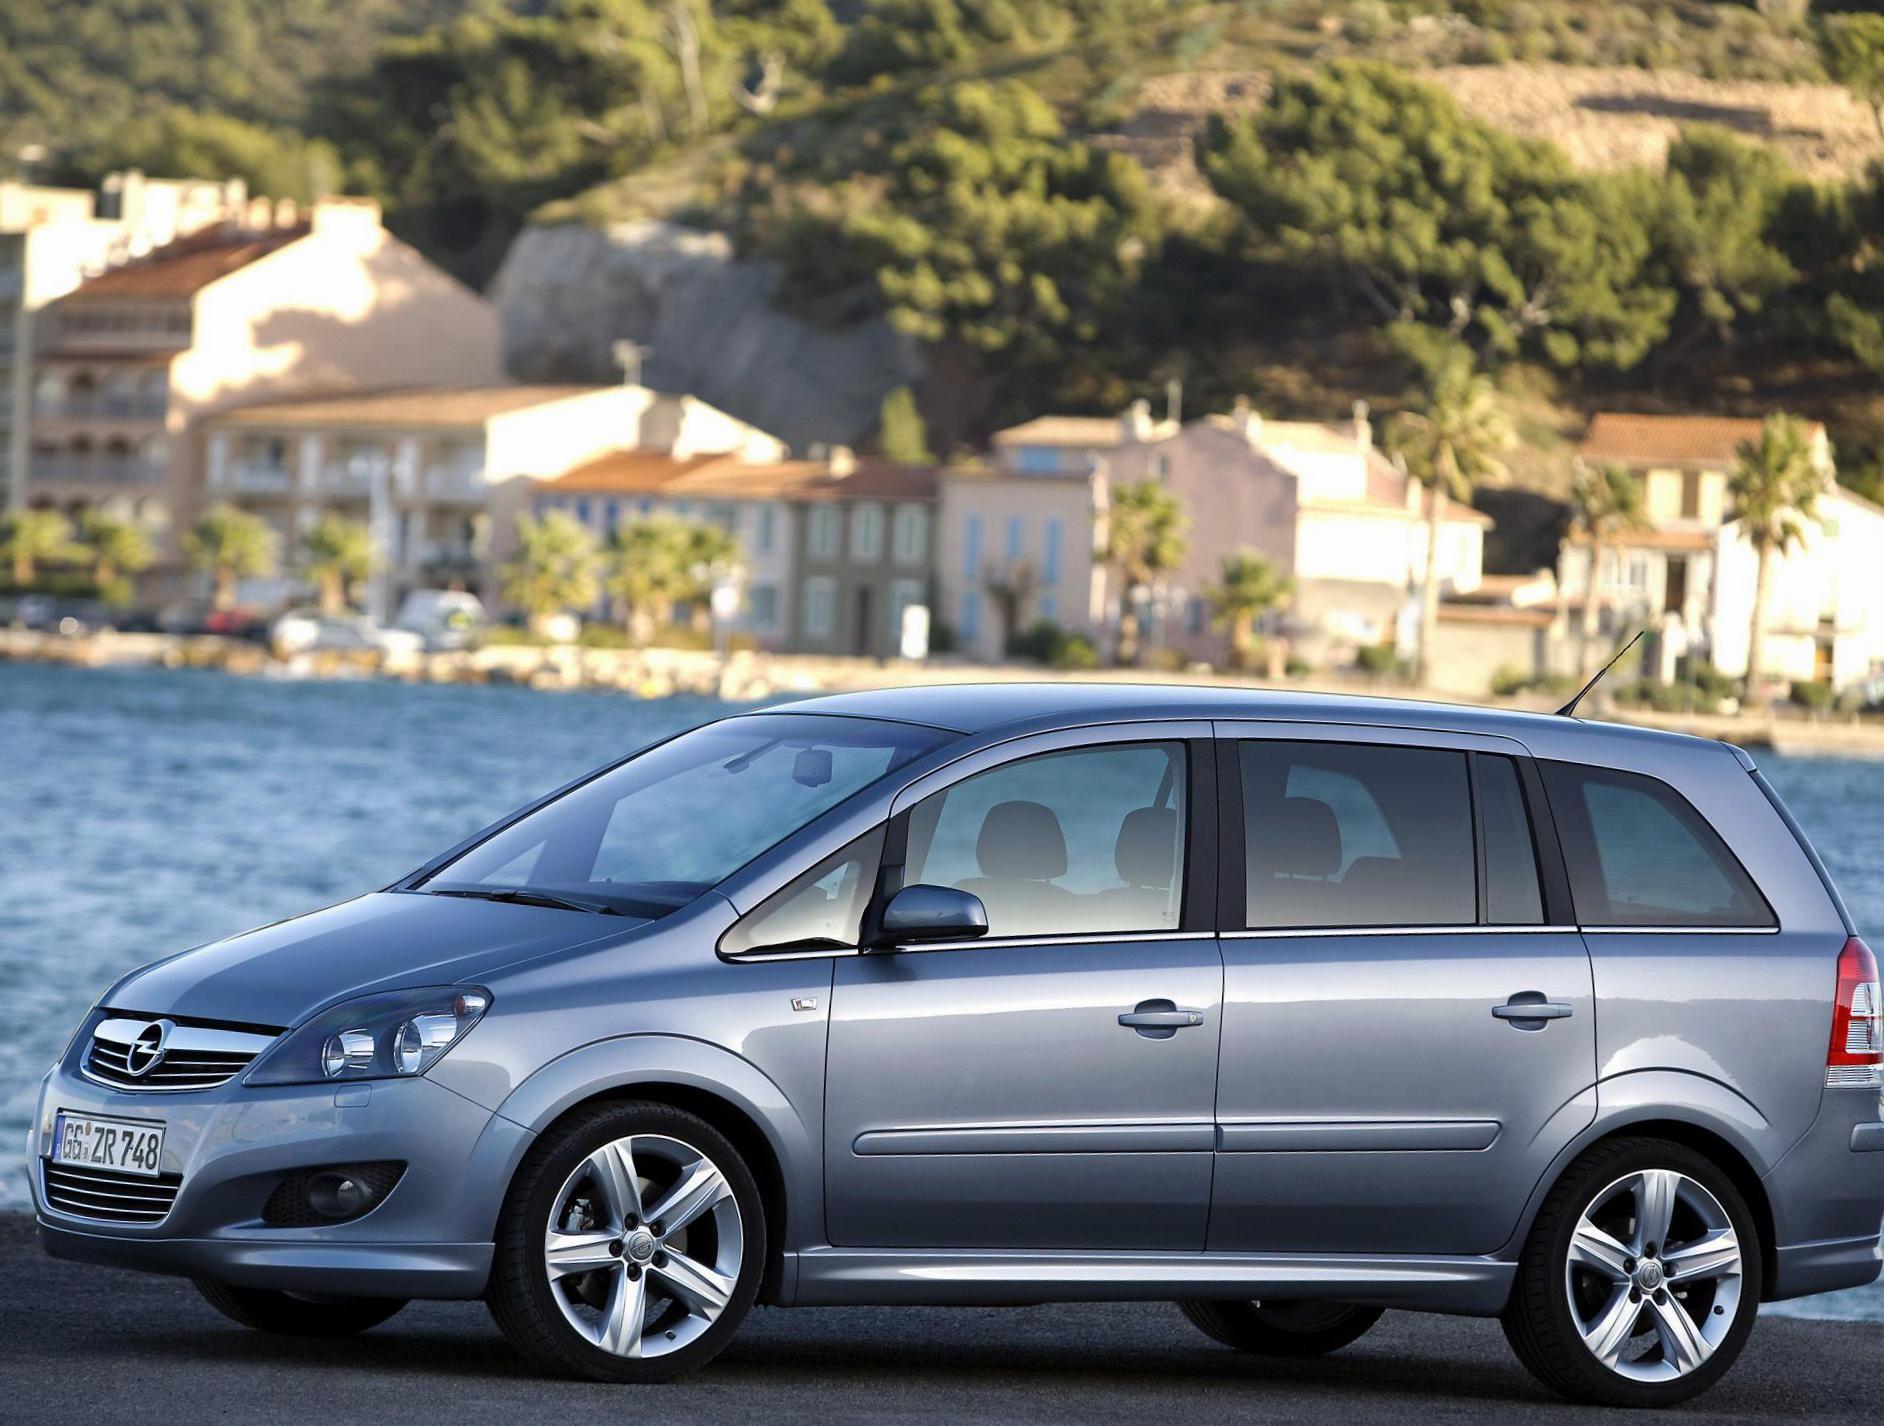 Opel Zafira B Tuning Http Autotras Com